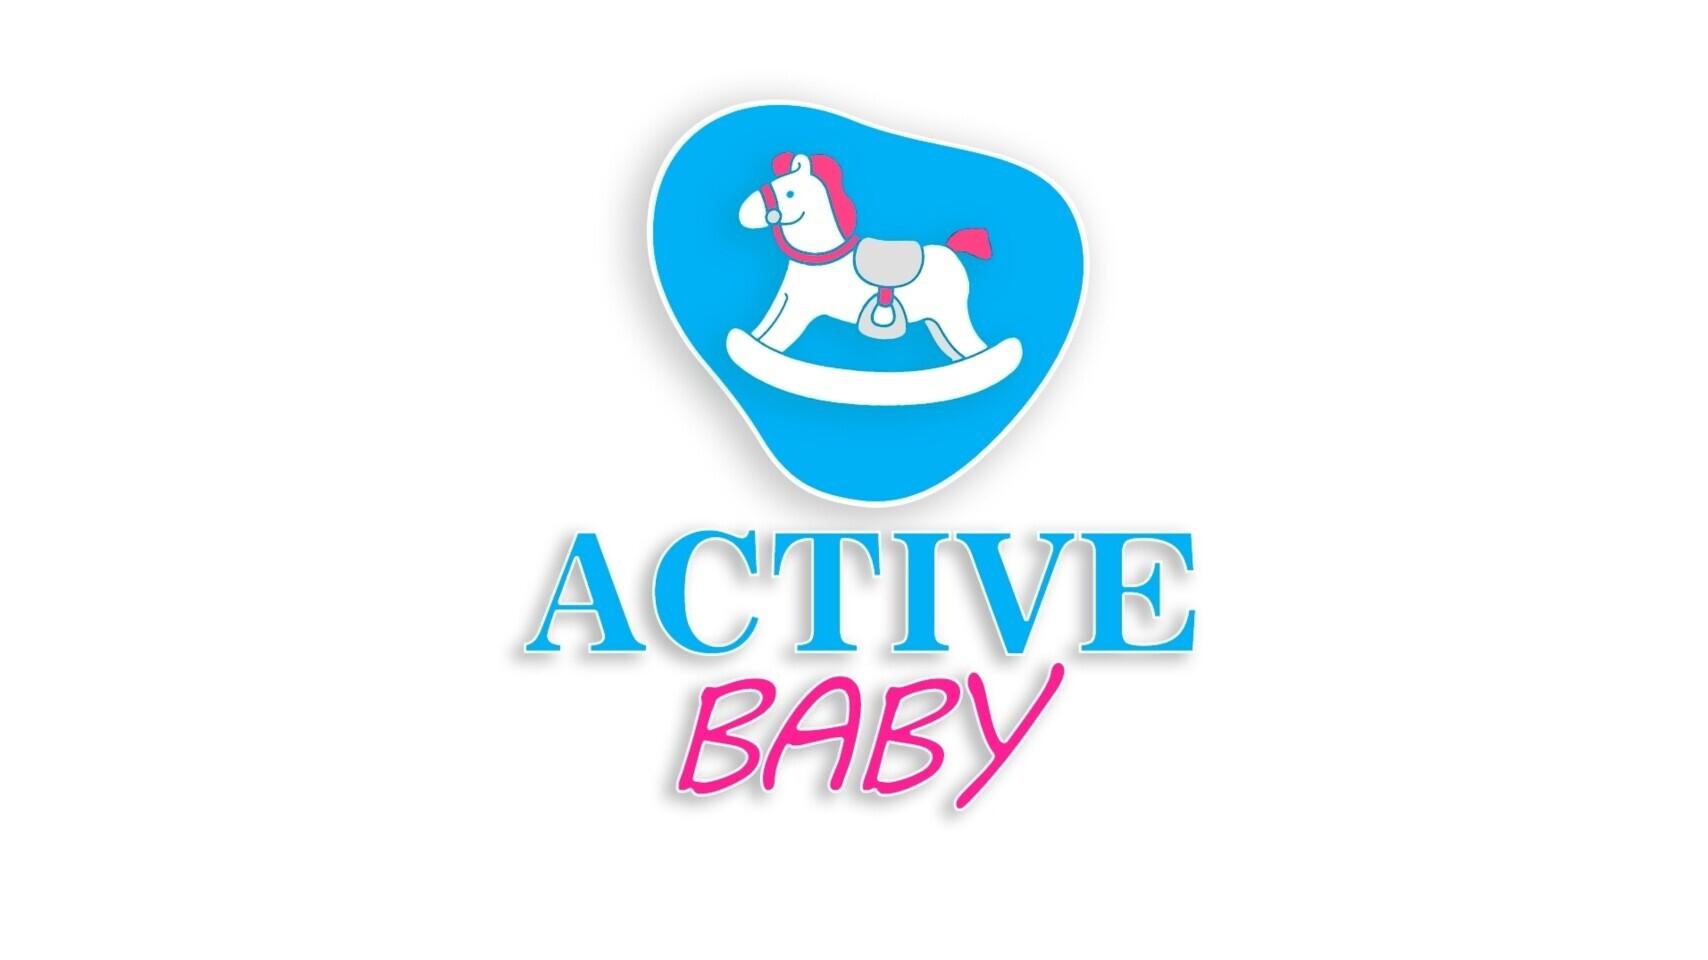 Active baby - Бизнес-профиль компании на lalafo.kg | Кыргызстан